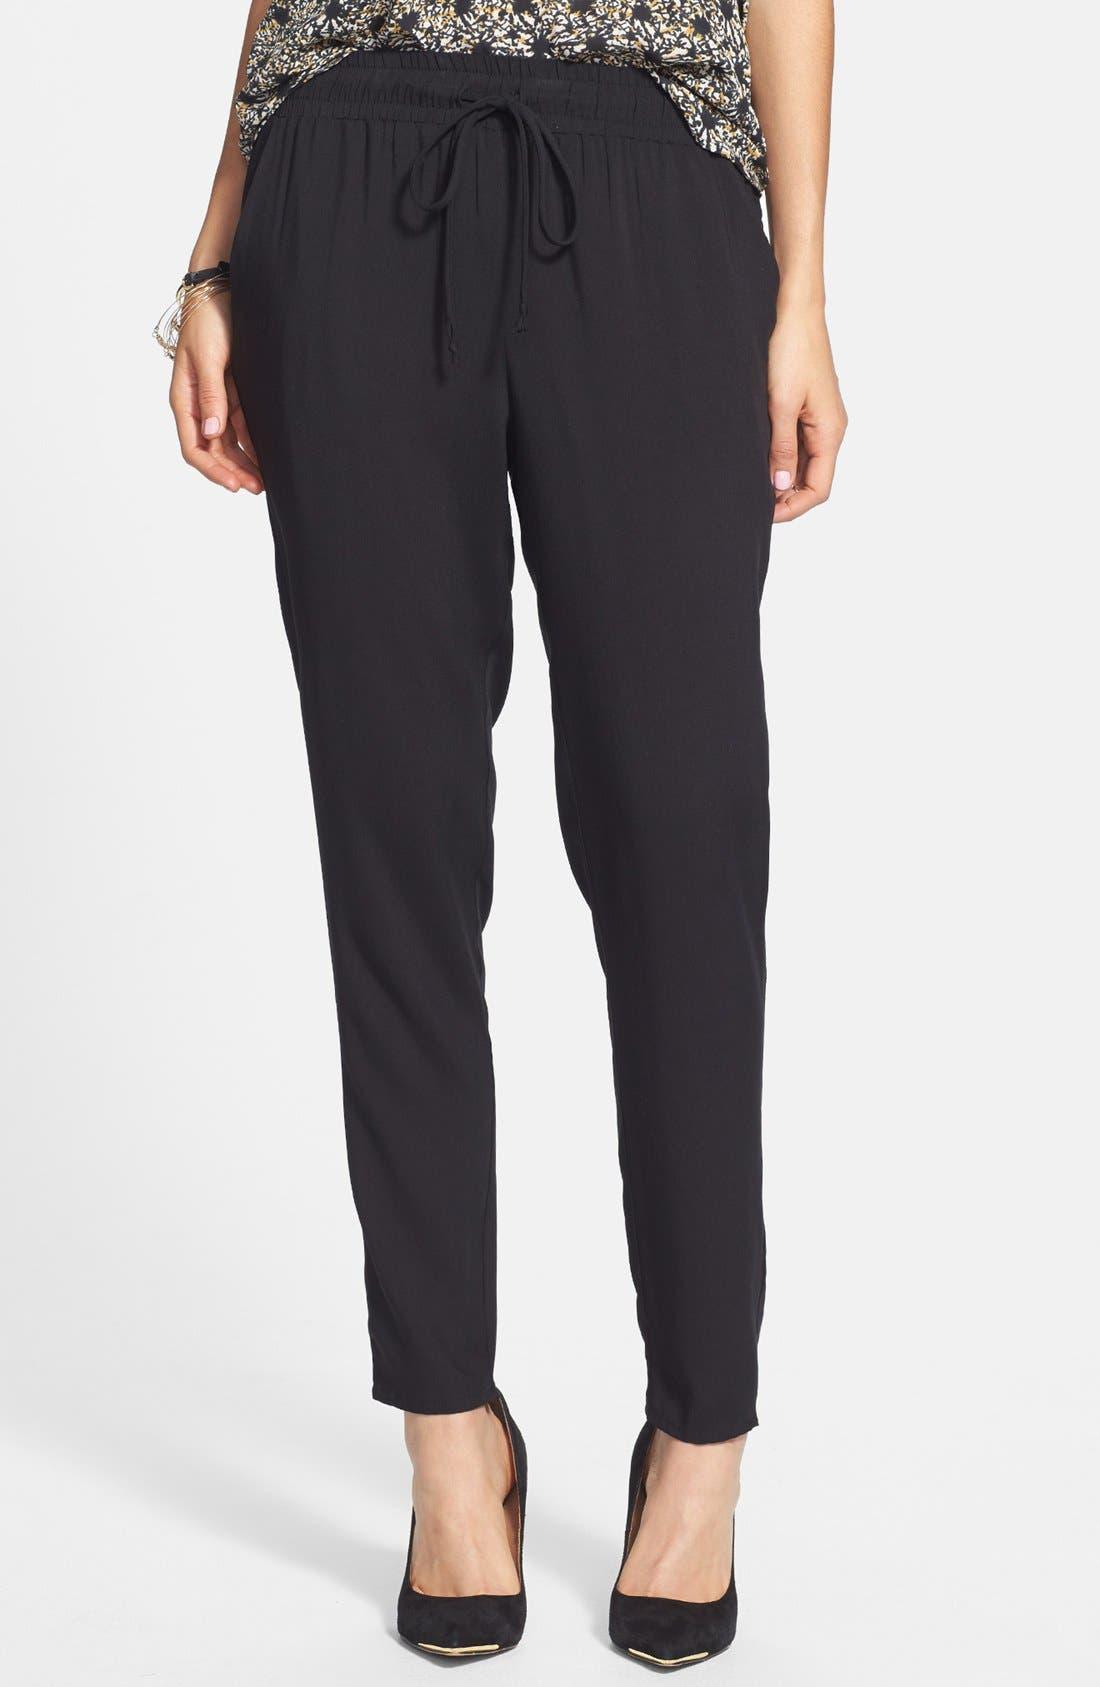 Alternate Image 1 Selected - Lush Track Pants (Juniors)